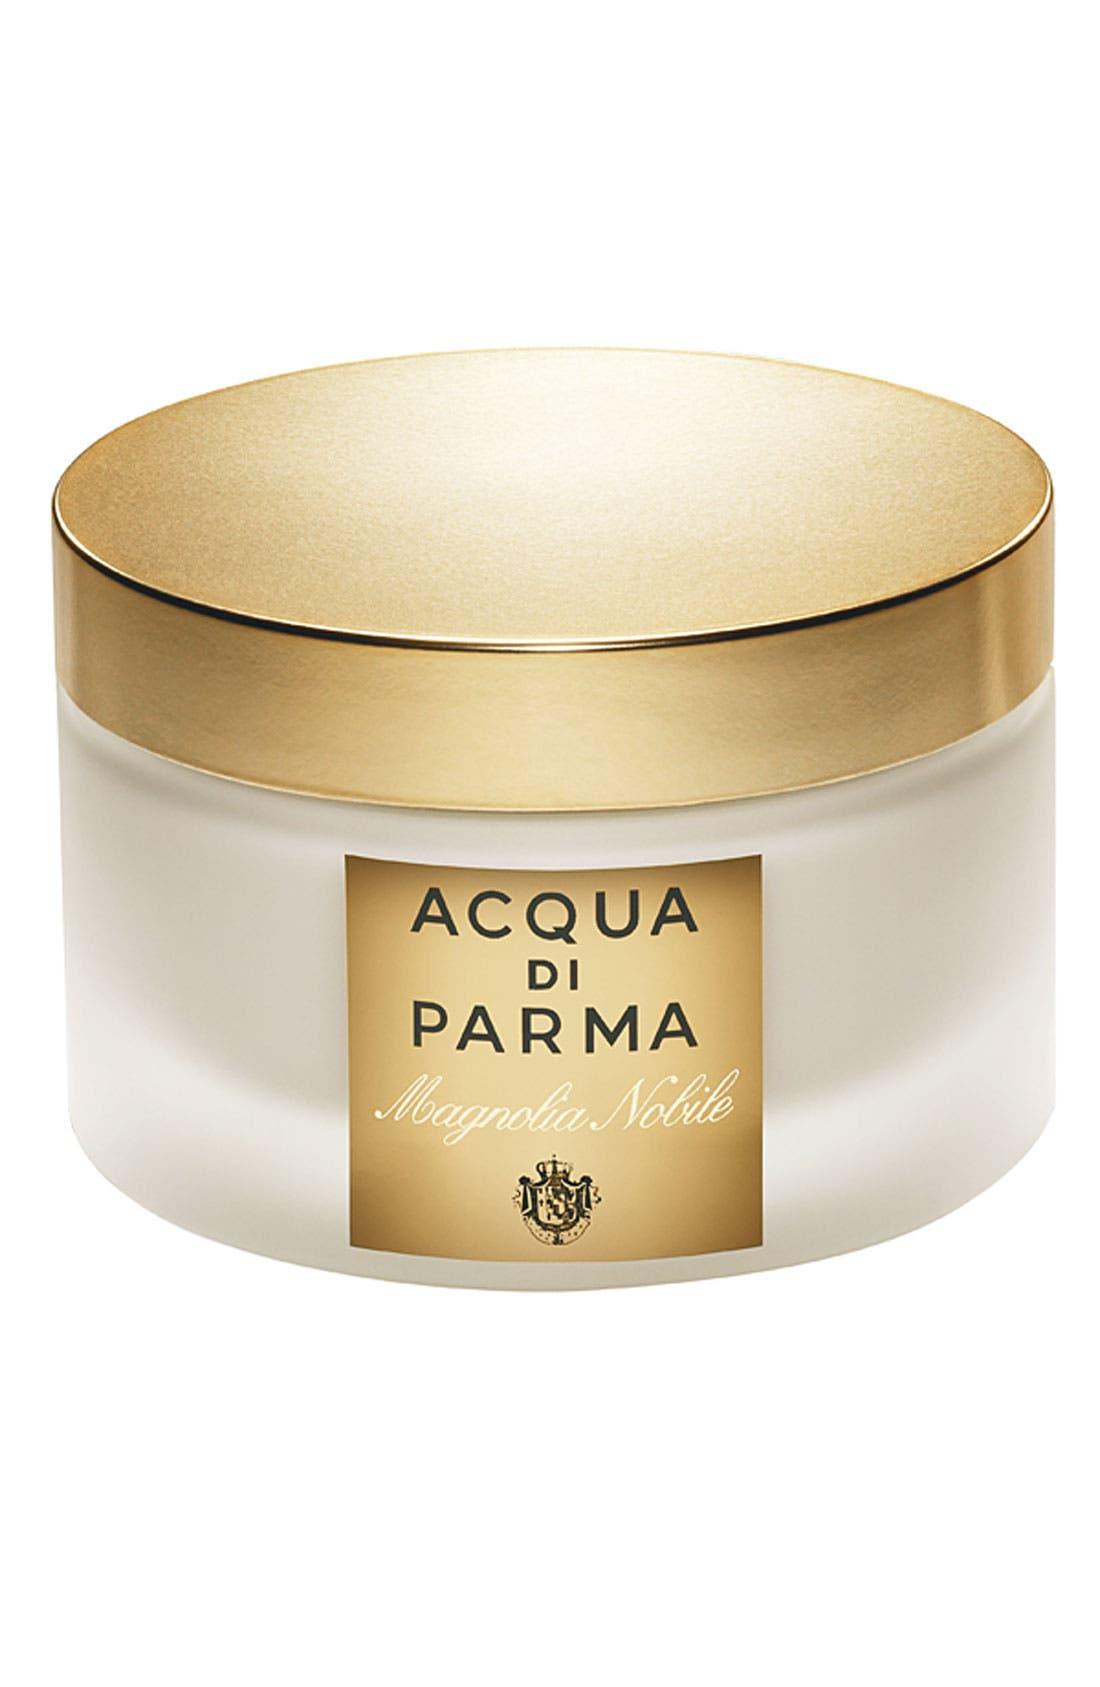 Acqua di Parma 'Magnolia Nobile' Body Cream